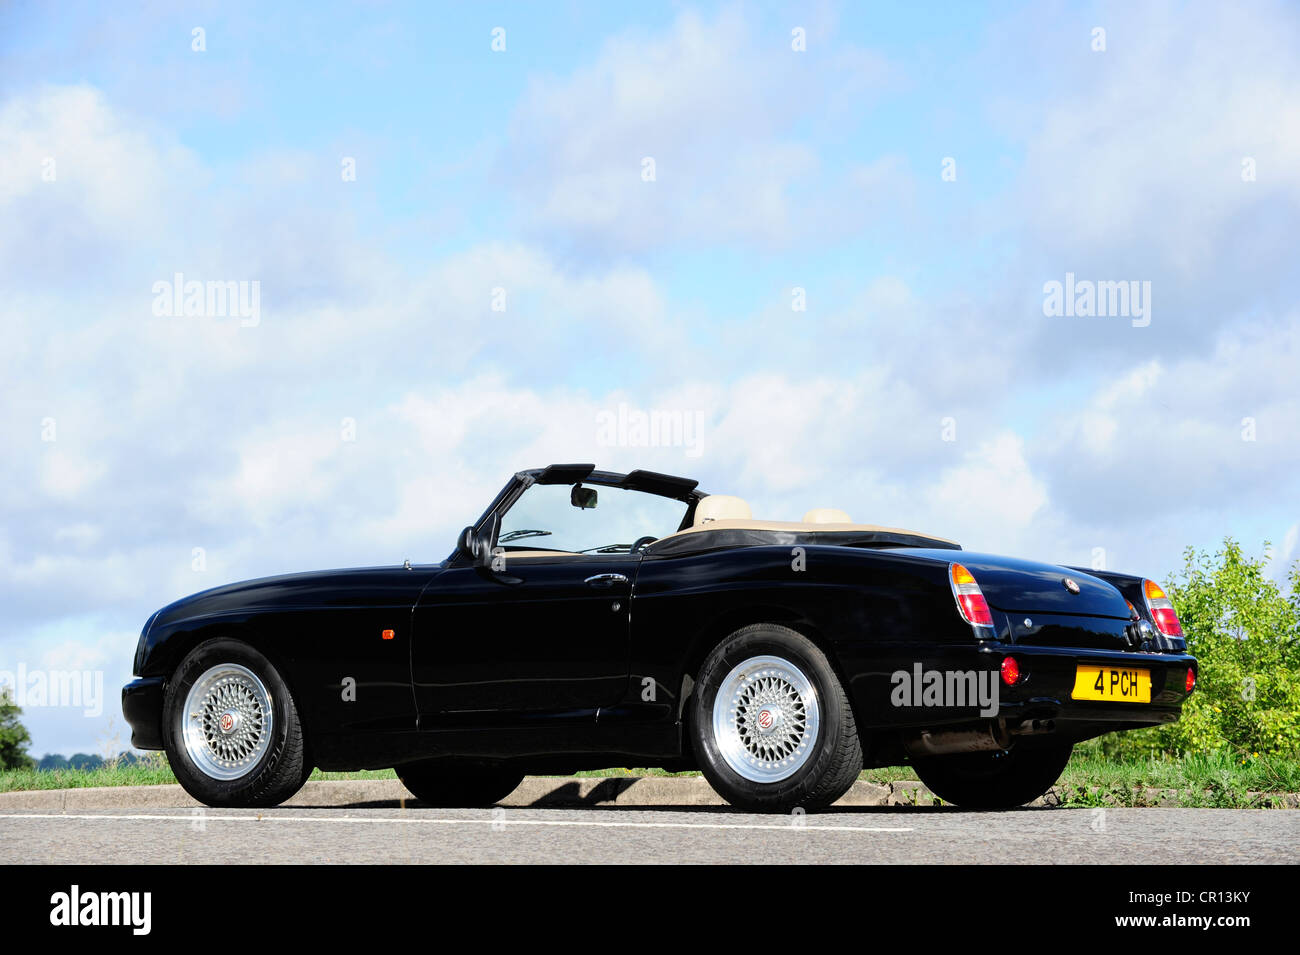 1996 MG RV8 Roadster britischer Sportwagen Stockbild